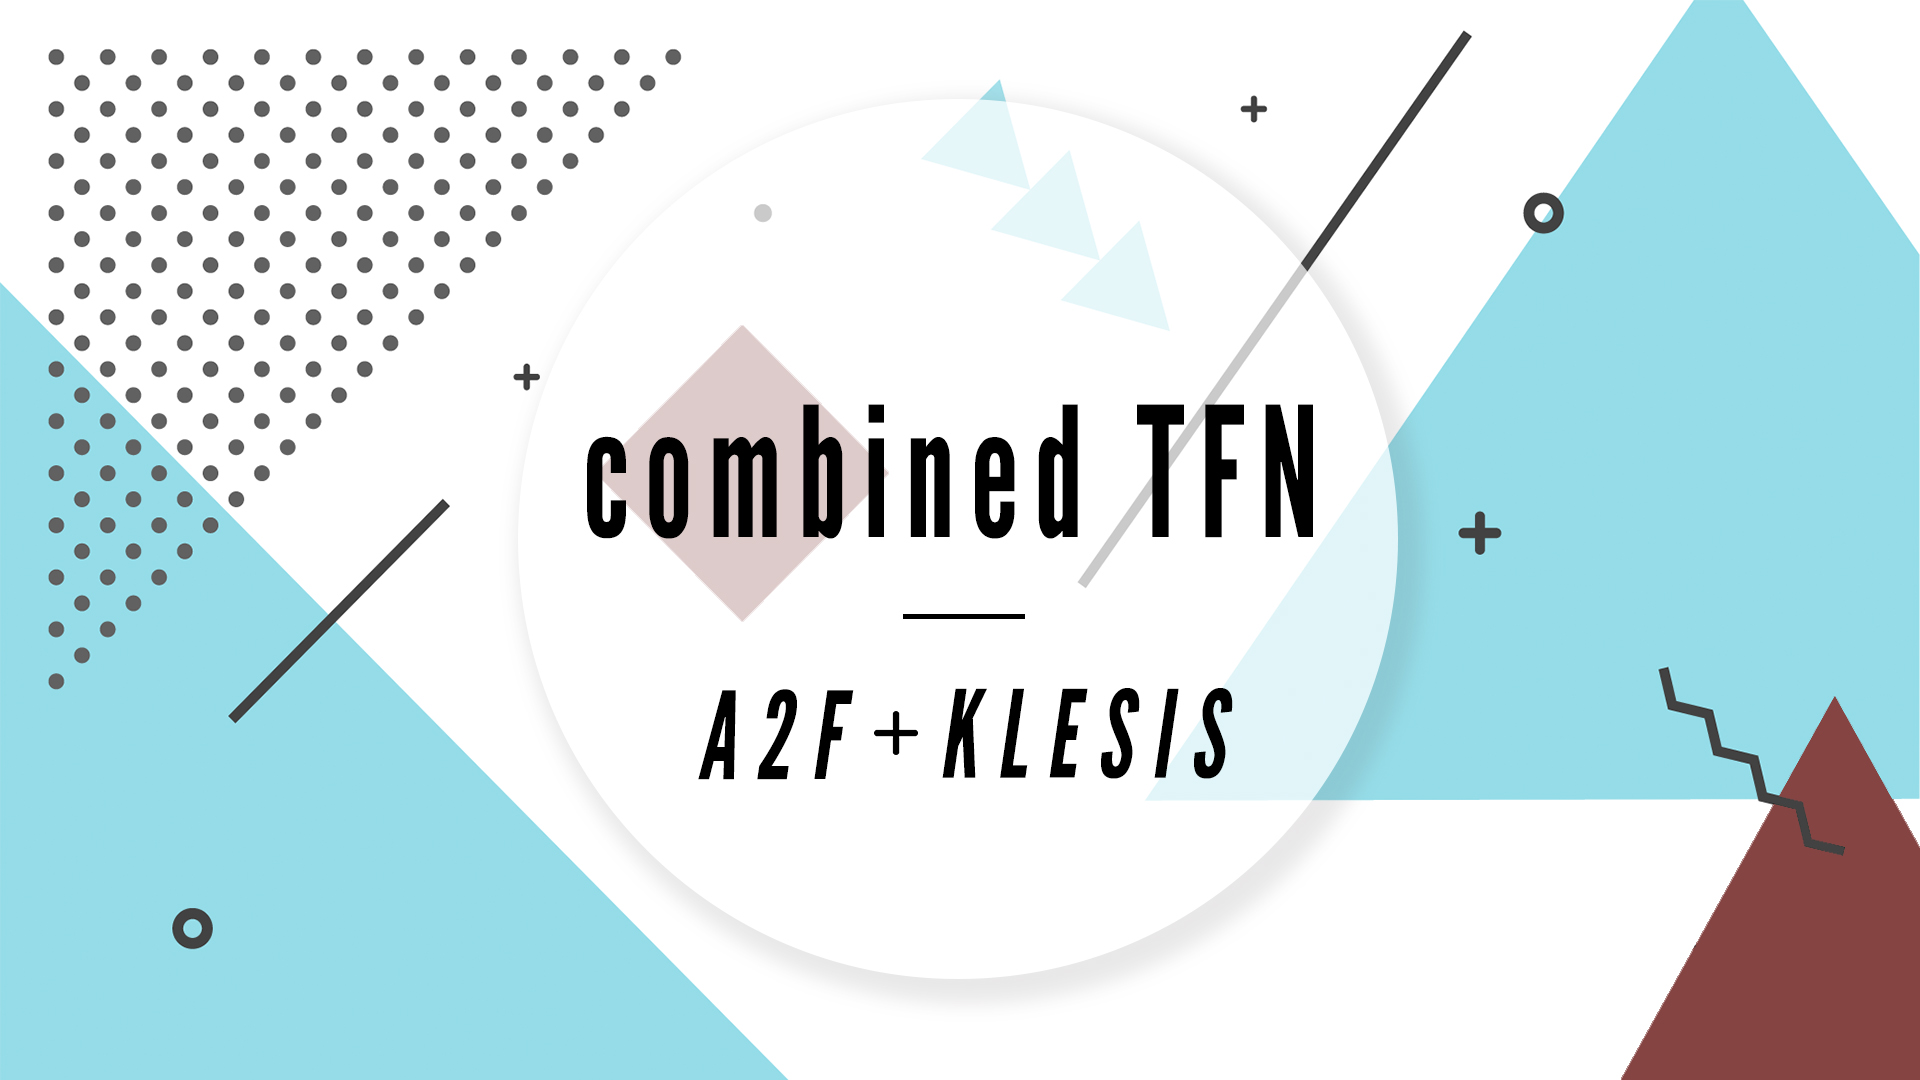 combinedTFN_propresplash_20190302_deborahreyes.jpg